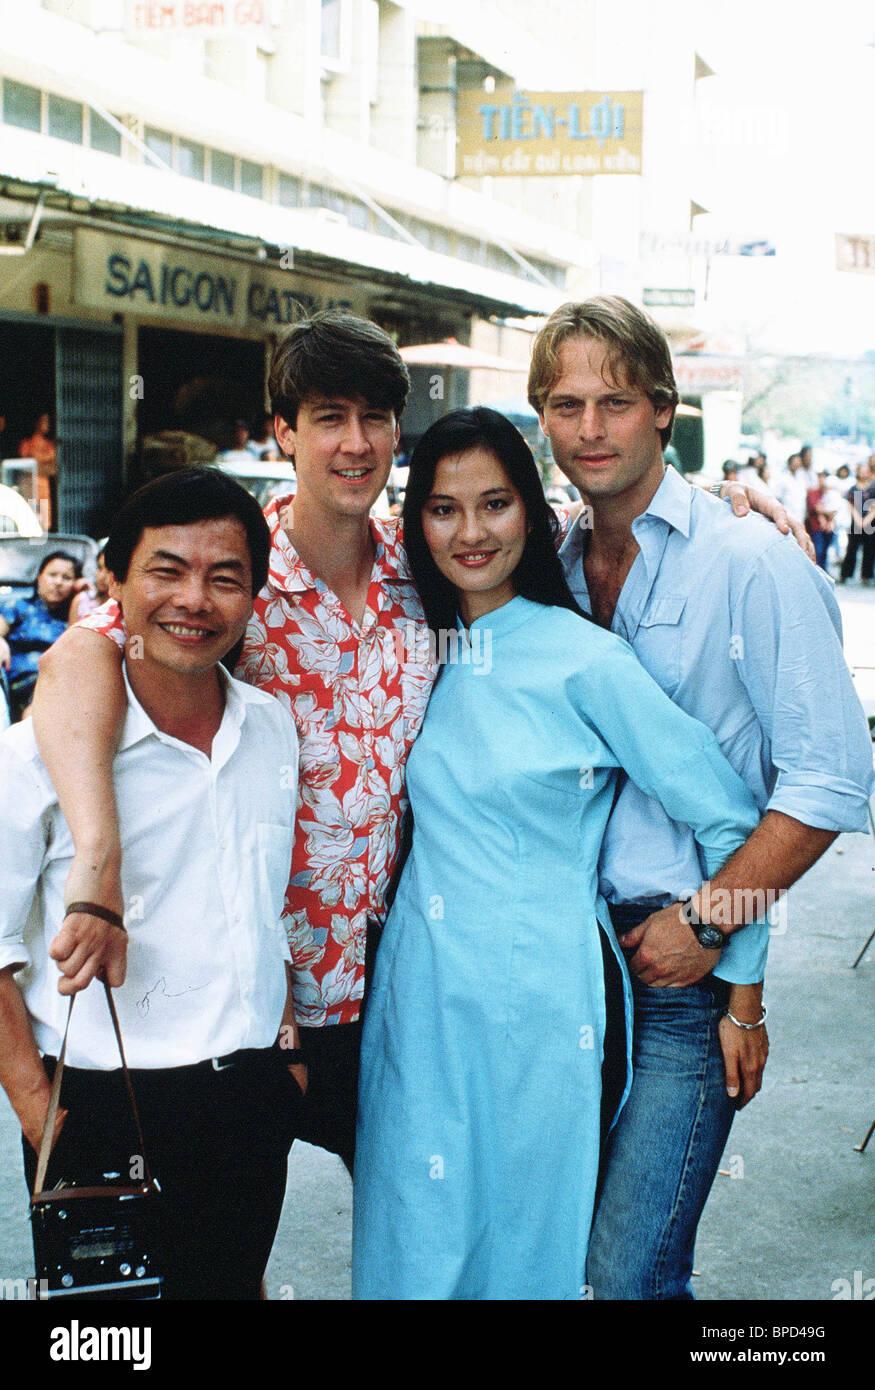 In scena con CU BA NGUYEN, ALAN RUCK, ROSALIND CHAO, sparatutto, 1988 Immagini Stock